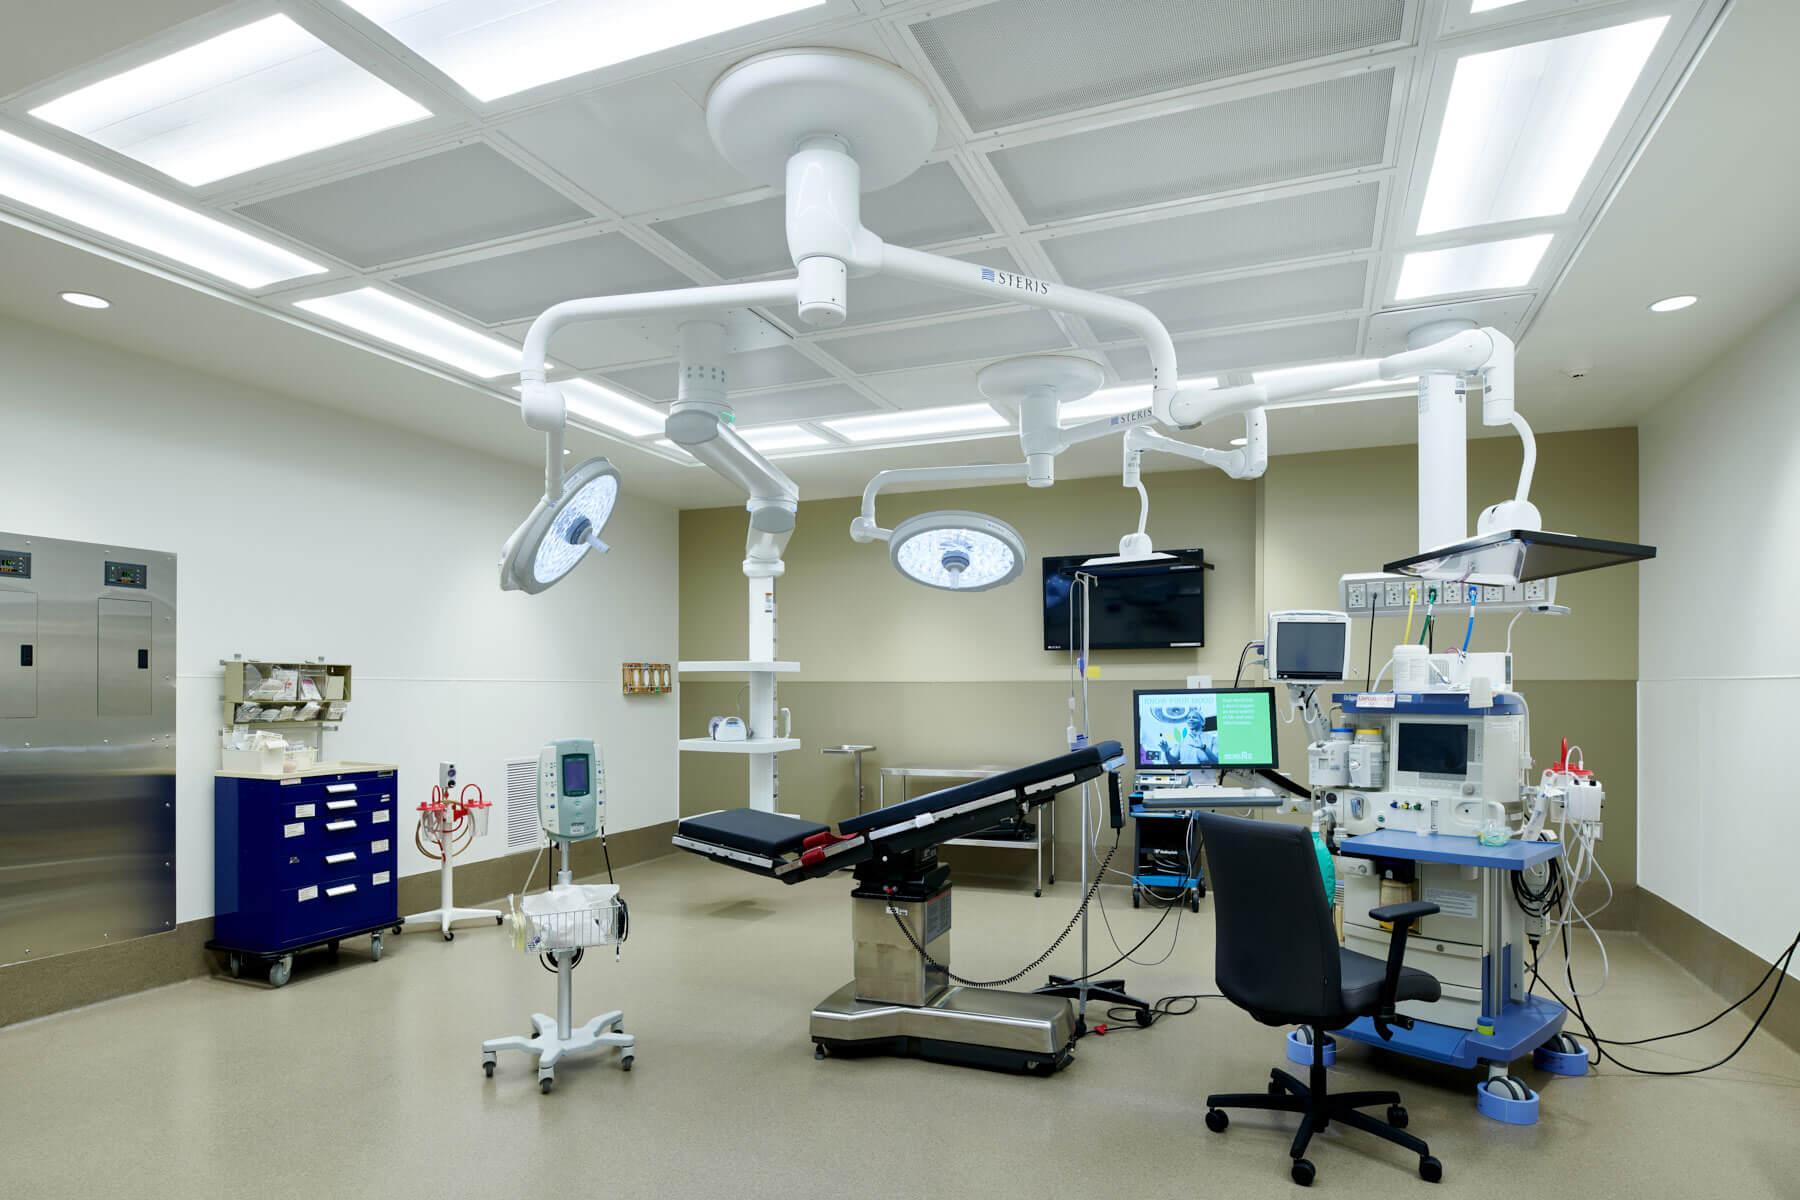 180815-Willmar_Surgery-005-S